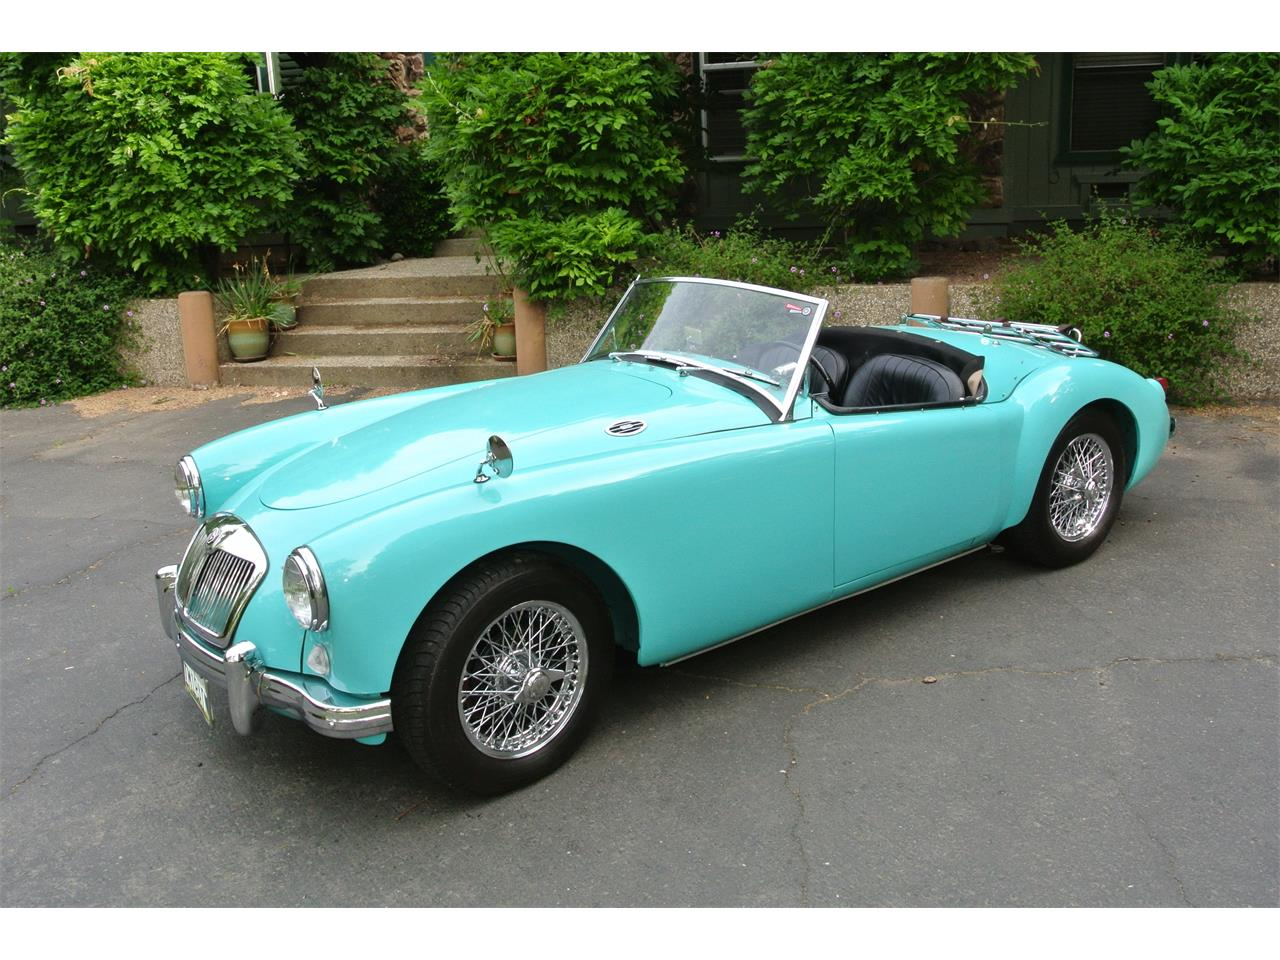 Large Picture of Classic 1958 MGA 1500 located in Orangevale California - $18,000.00 - EK6K